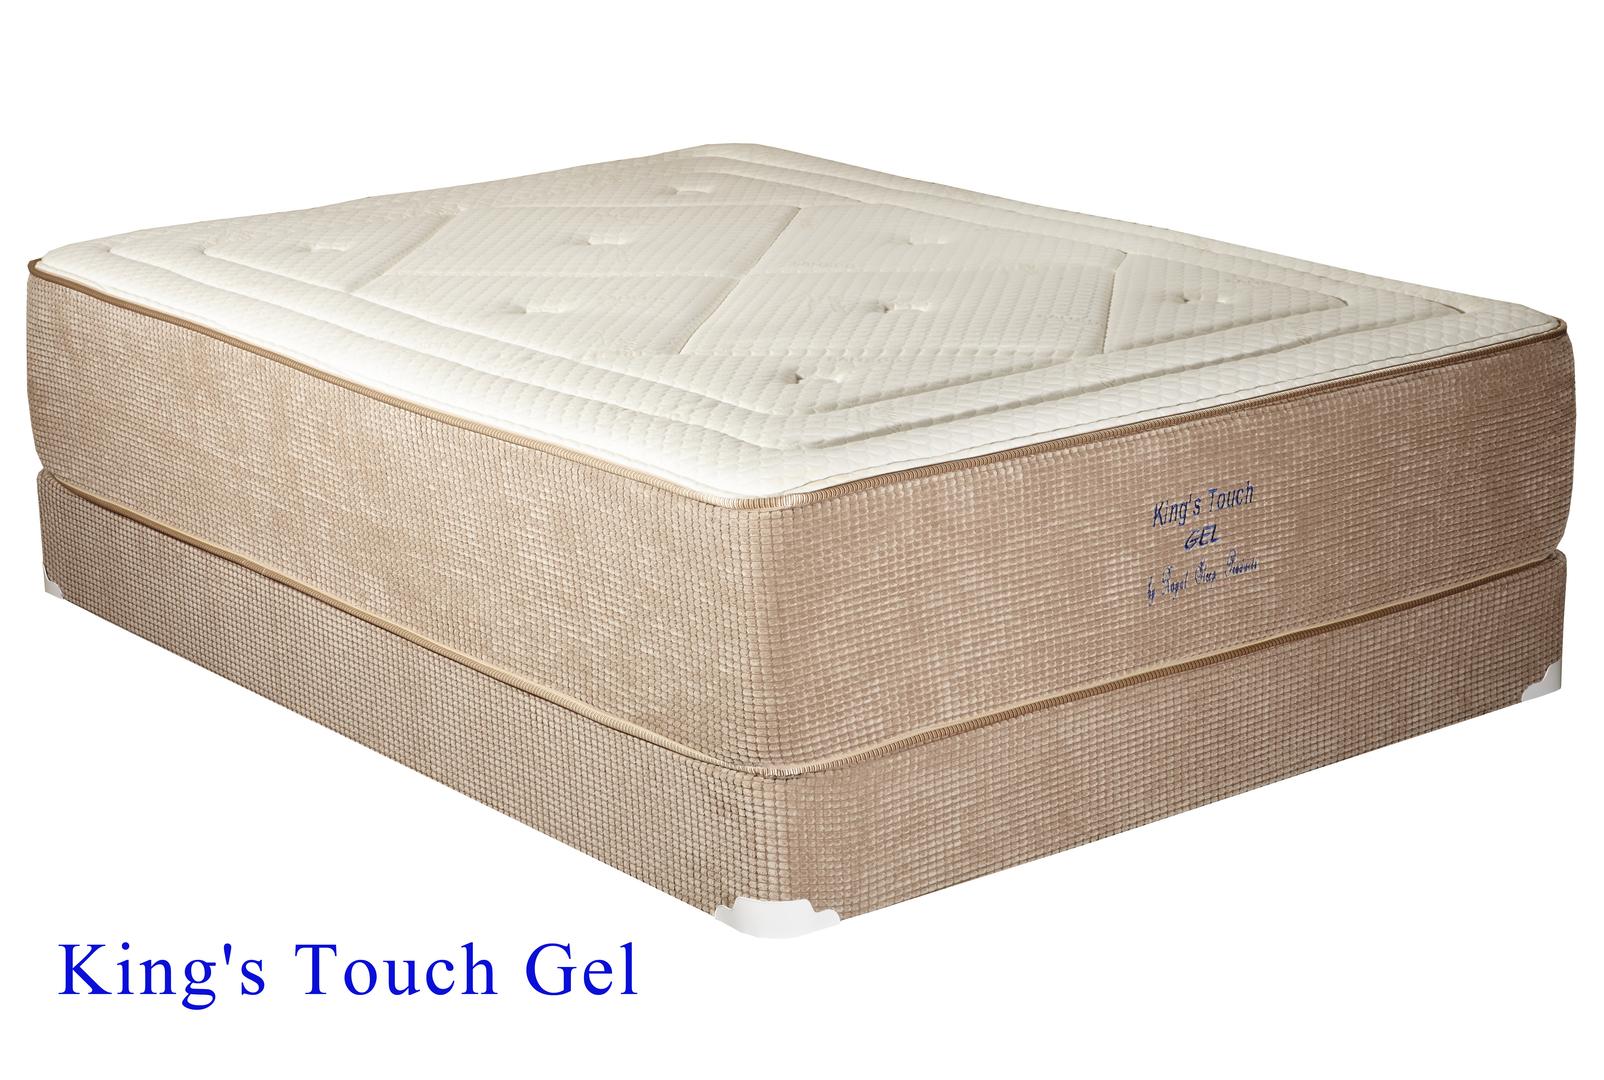 about all of mattress futon pad homes image ideas padcapricornradio